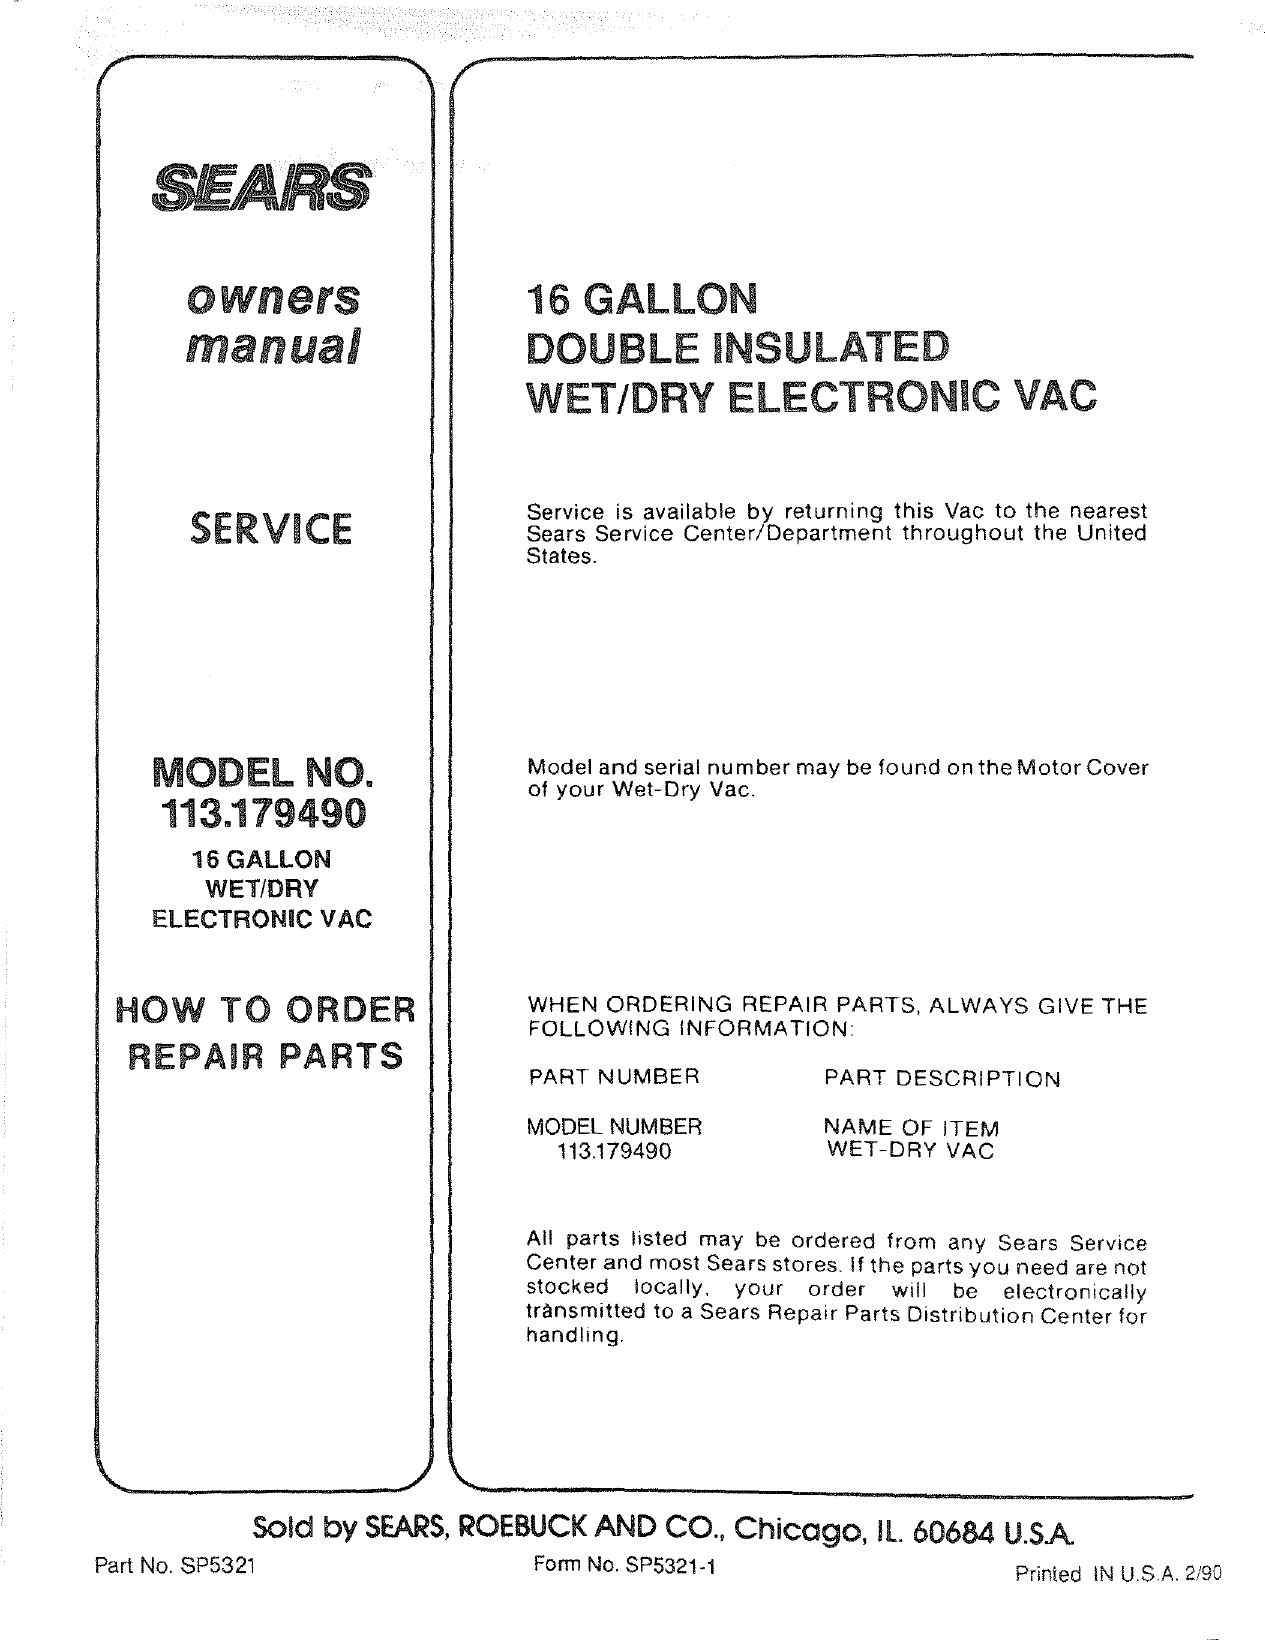 Craftsman 113179490 User Manual 16 GALLON ELECTRONIC WET DRY VAC ...